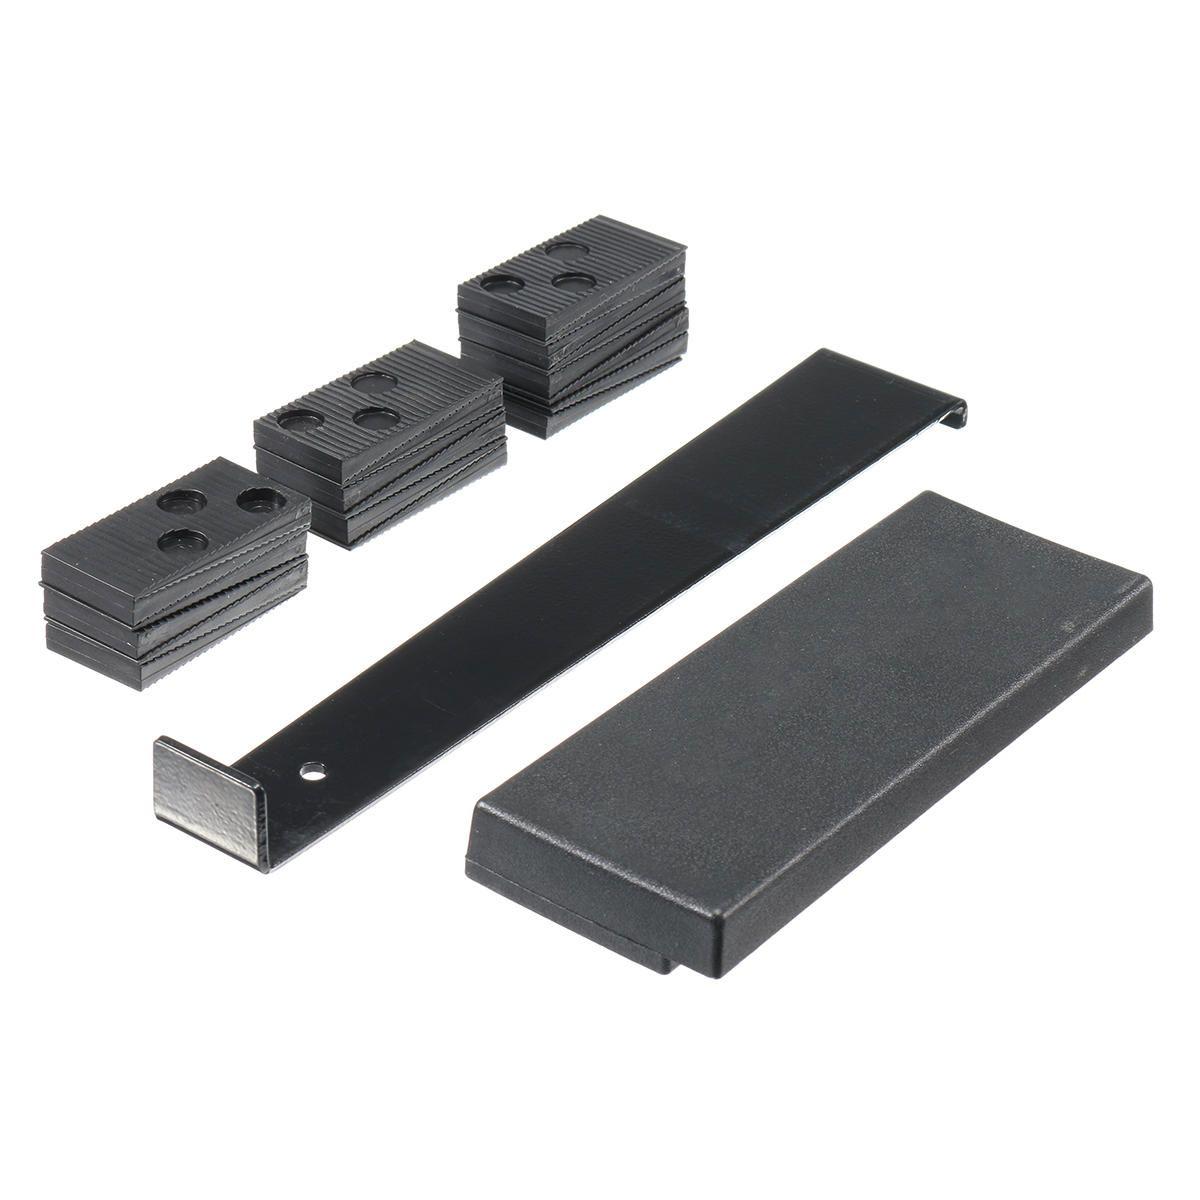 22pcs Wood Flooring Installer Tool Kit Spacers Tapping Block Pull Bar Set